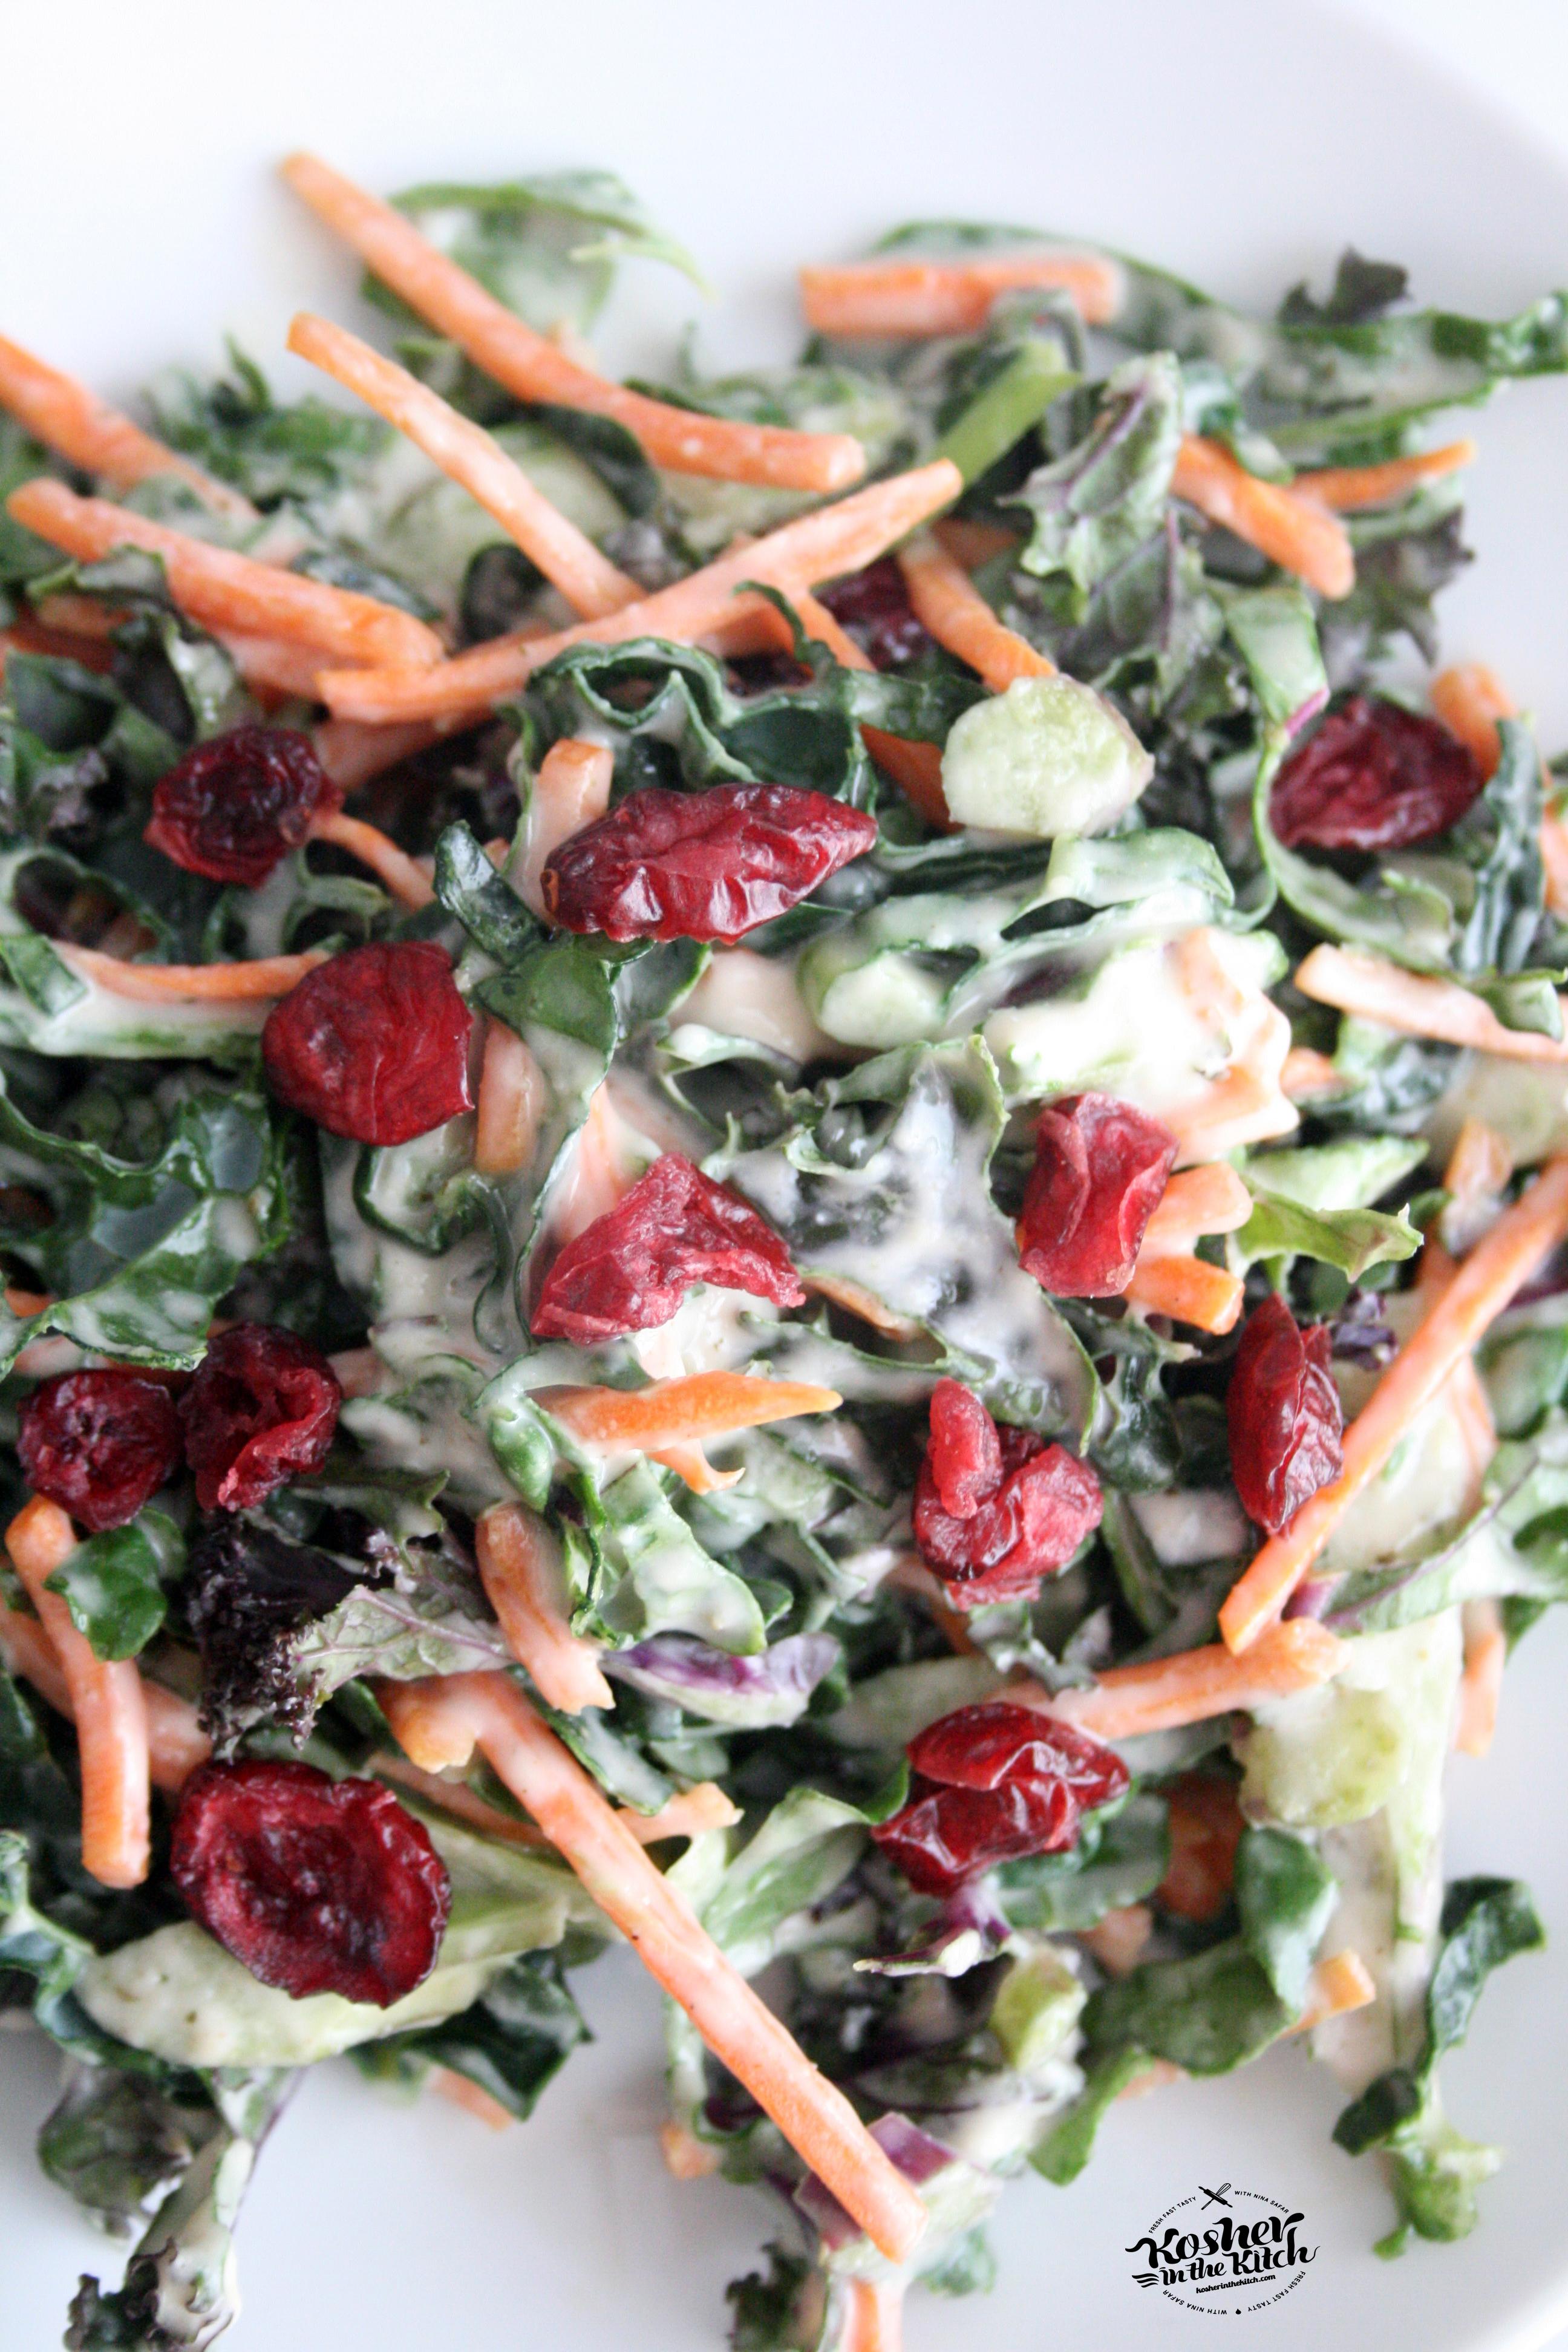 Shredded Kale Salad with Tahini Dressing Shredded Kale Salad with ...